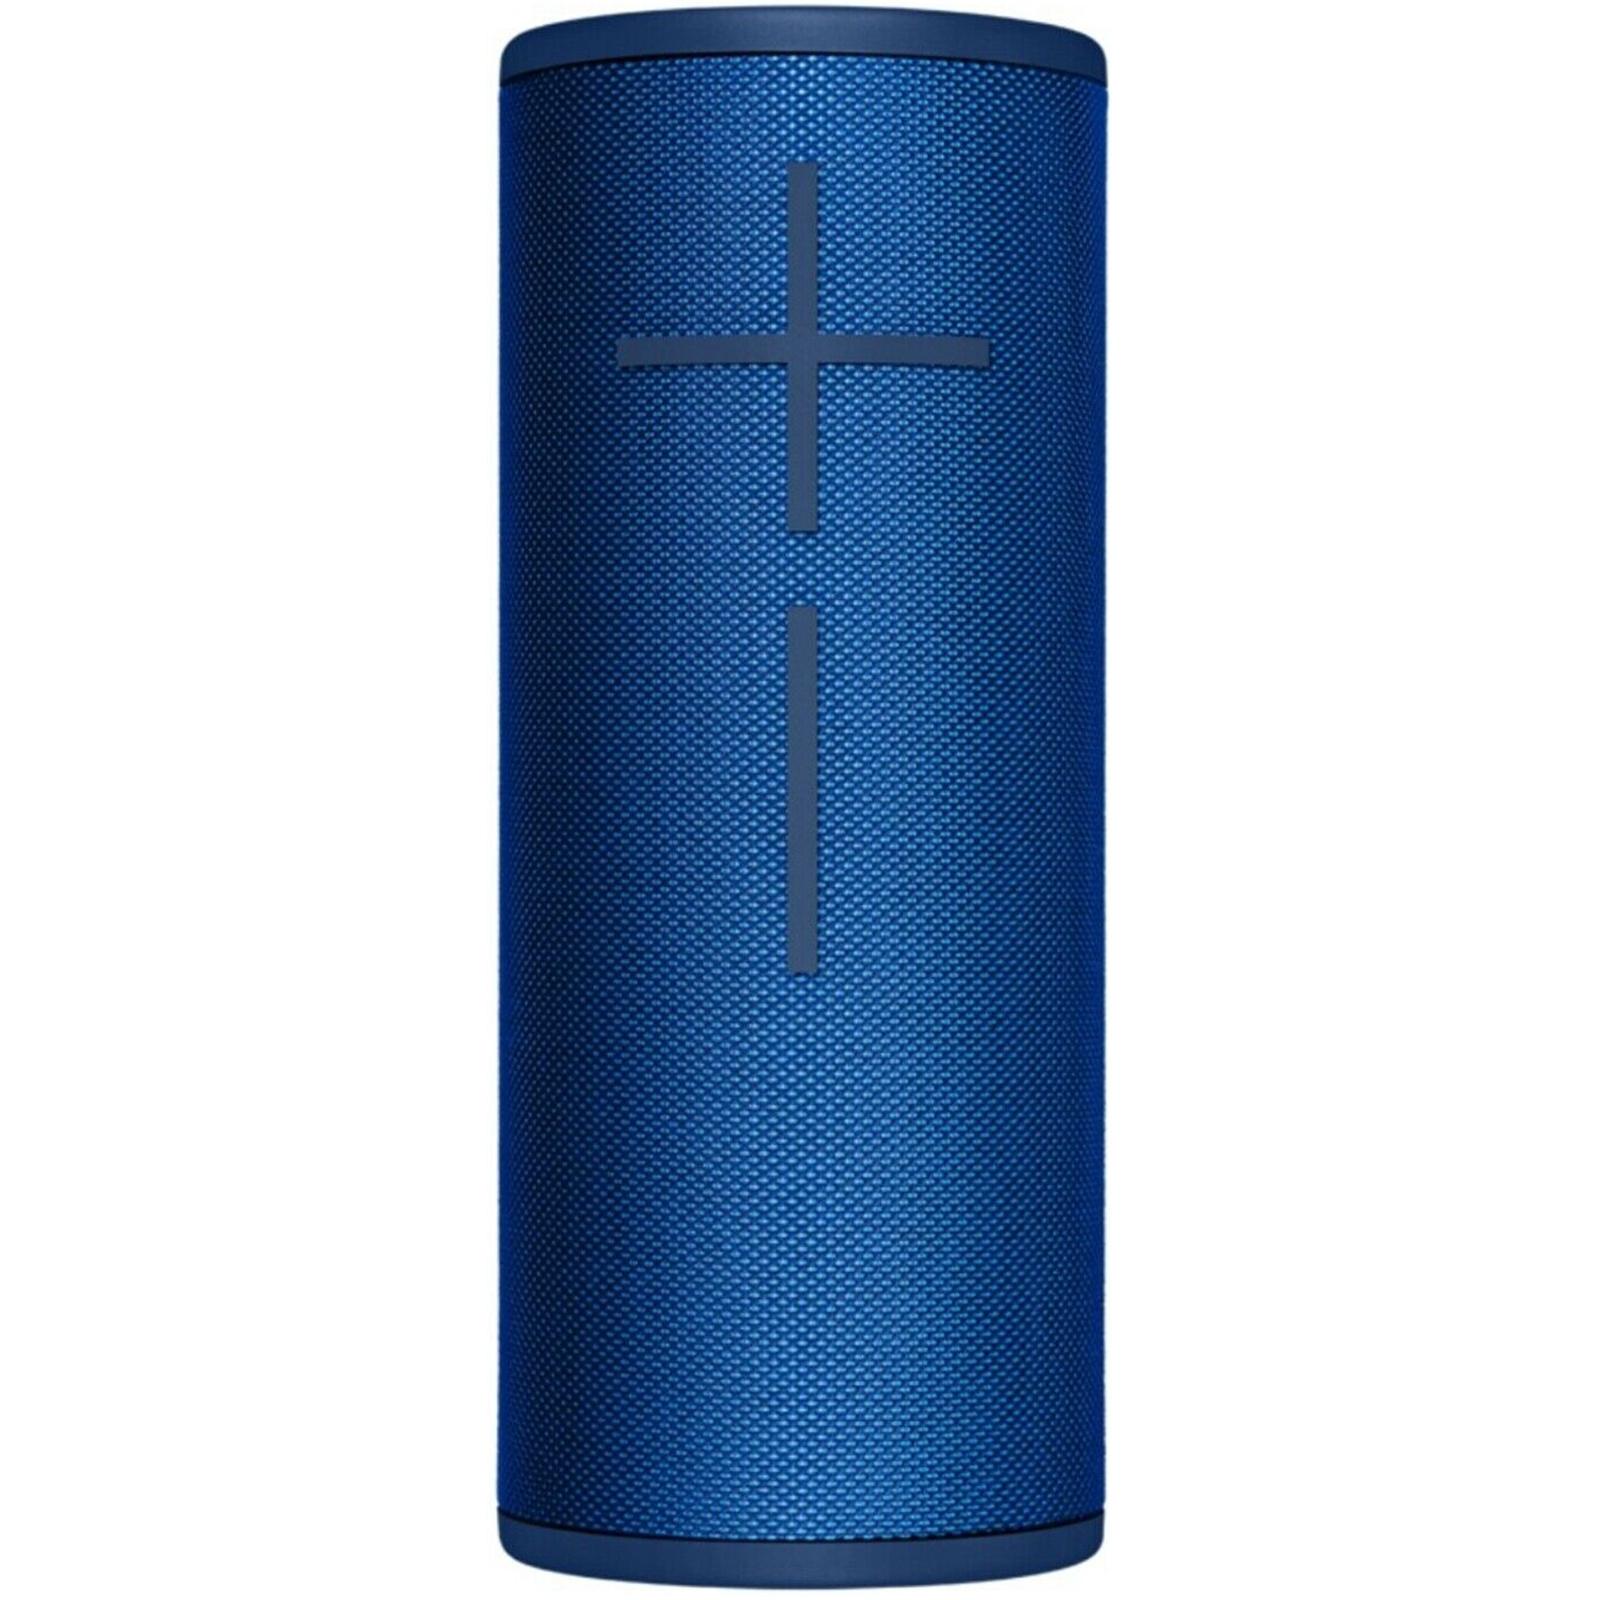 Buy the Ultimate Ears UE BOOM 3 Wireless Portable Bluetooth Speaker -  Lagoon    ( 984-001374 ) online